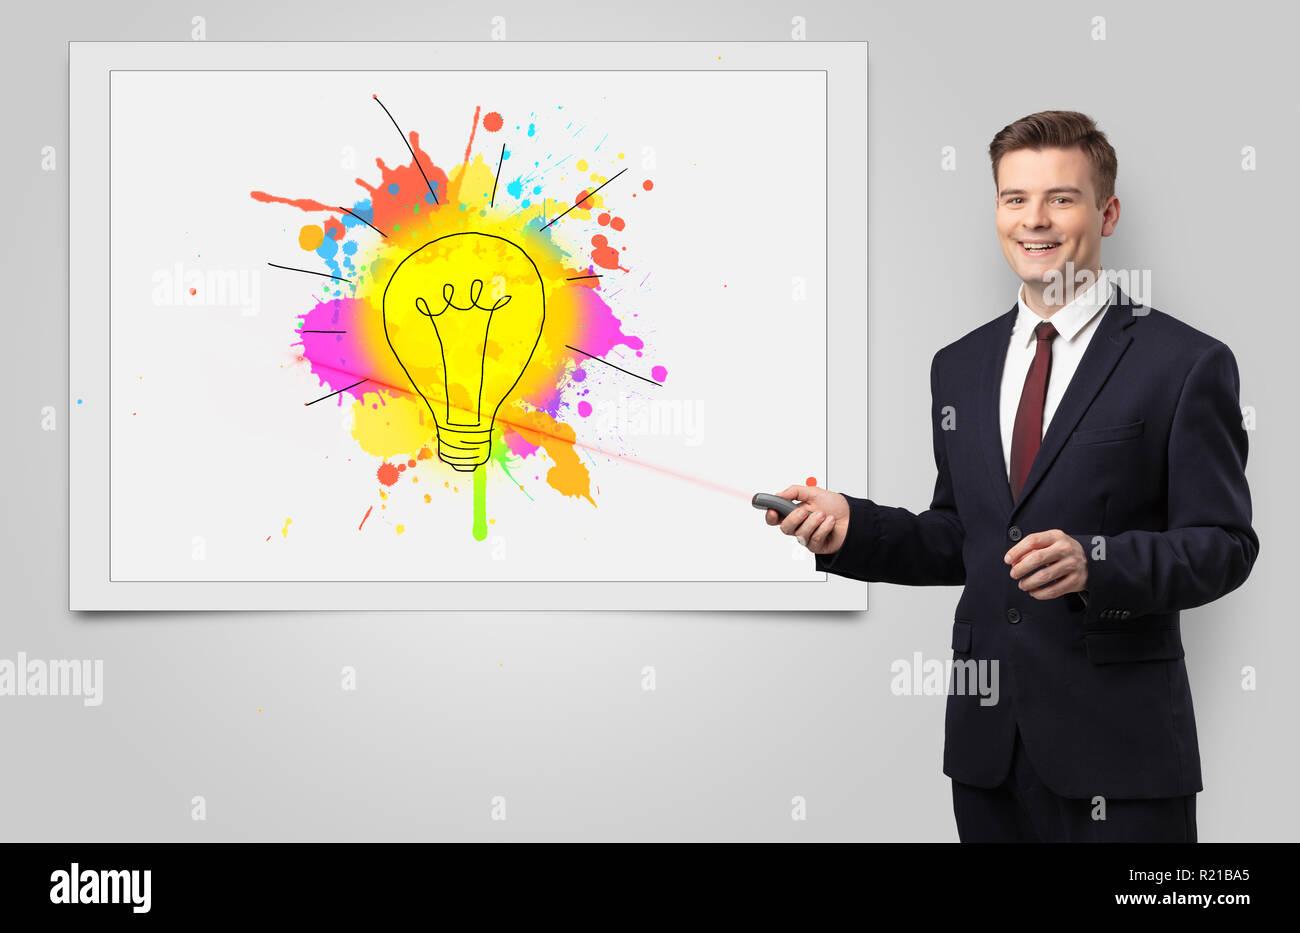 Hombre con puntero láser presentación innovadora idea Foto de stock